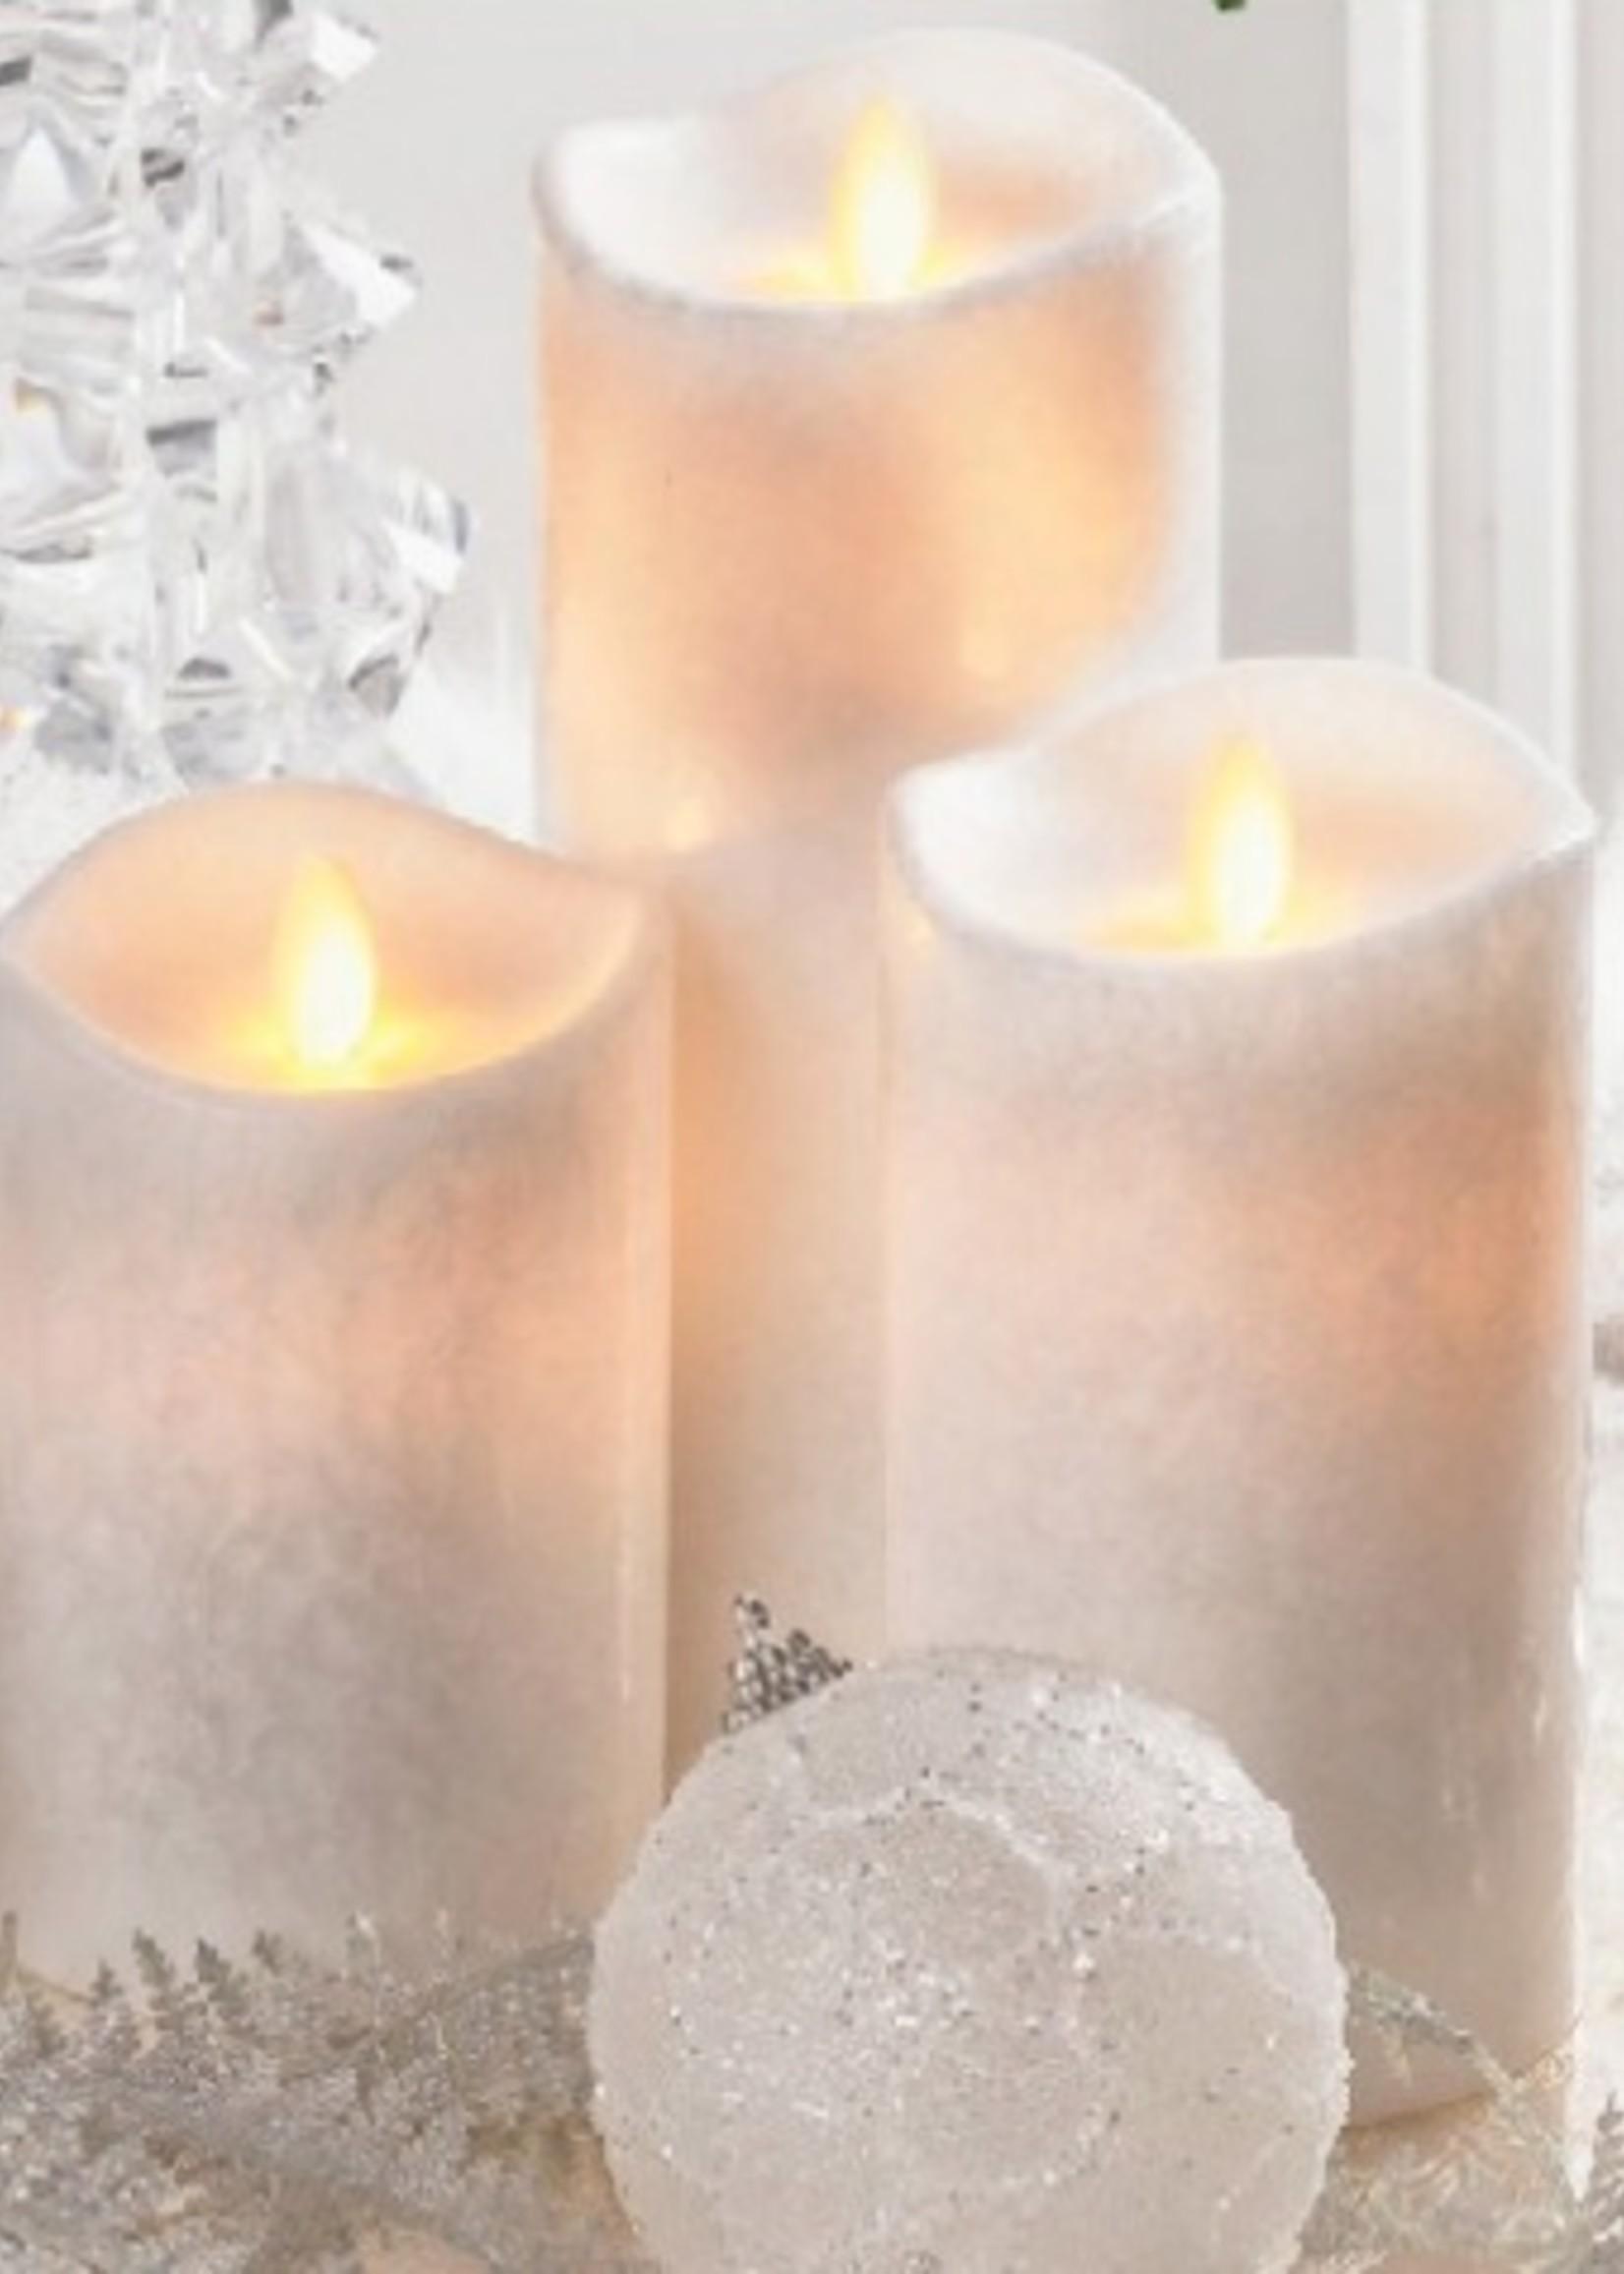 LuxuryLite 3x5 Wax LED Pillar Candle White